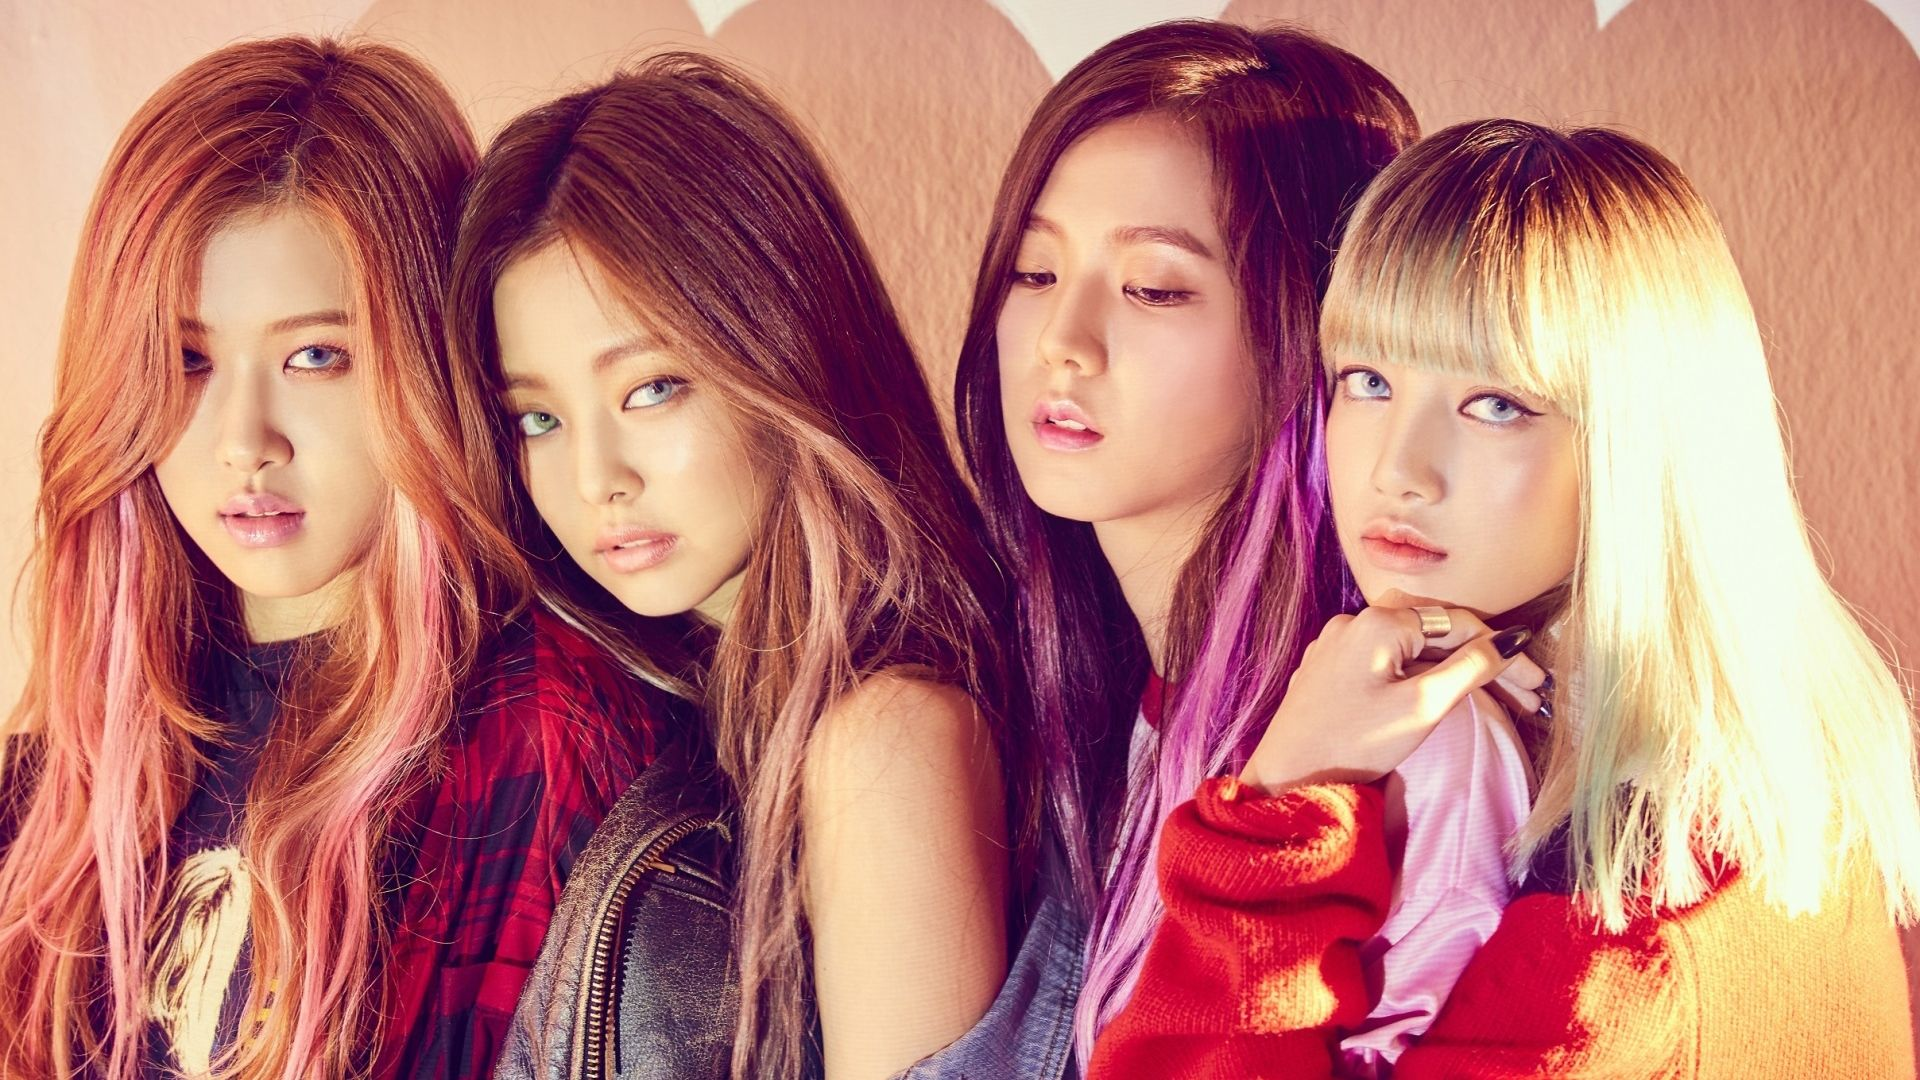 Blackpink K Pop Group Members Hd Wallpaper Jennie Jennie Rose Park Chae Young Lisa Lalisa Manoban Jisoo Kim Ji Soo 1920x1080 Gambar Kpop Kim